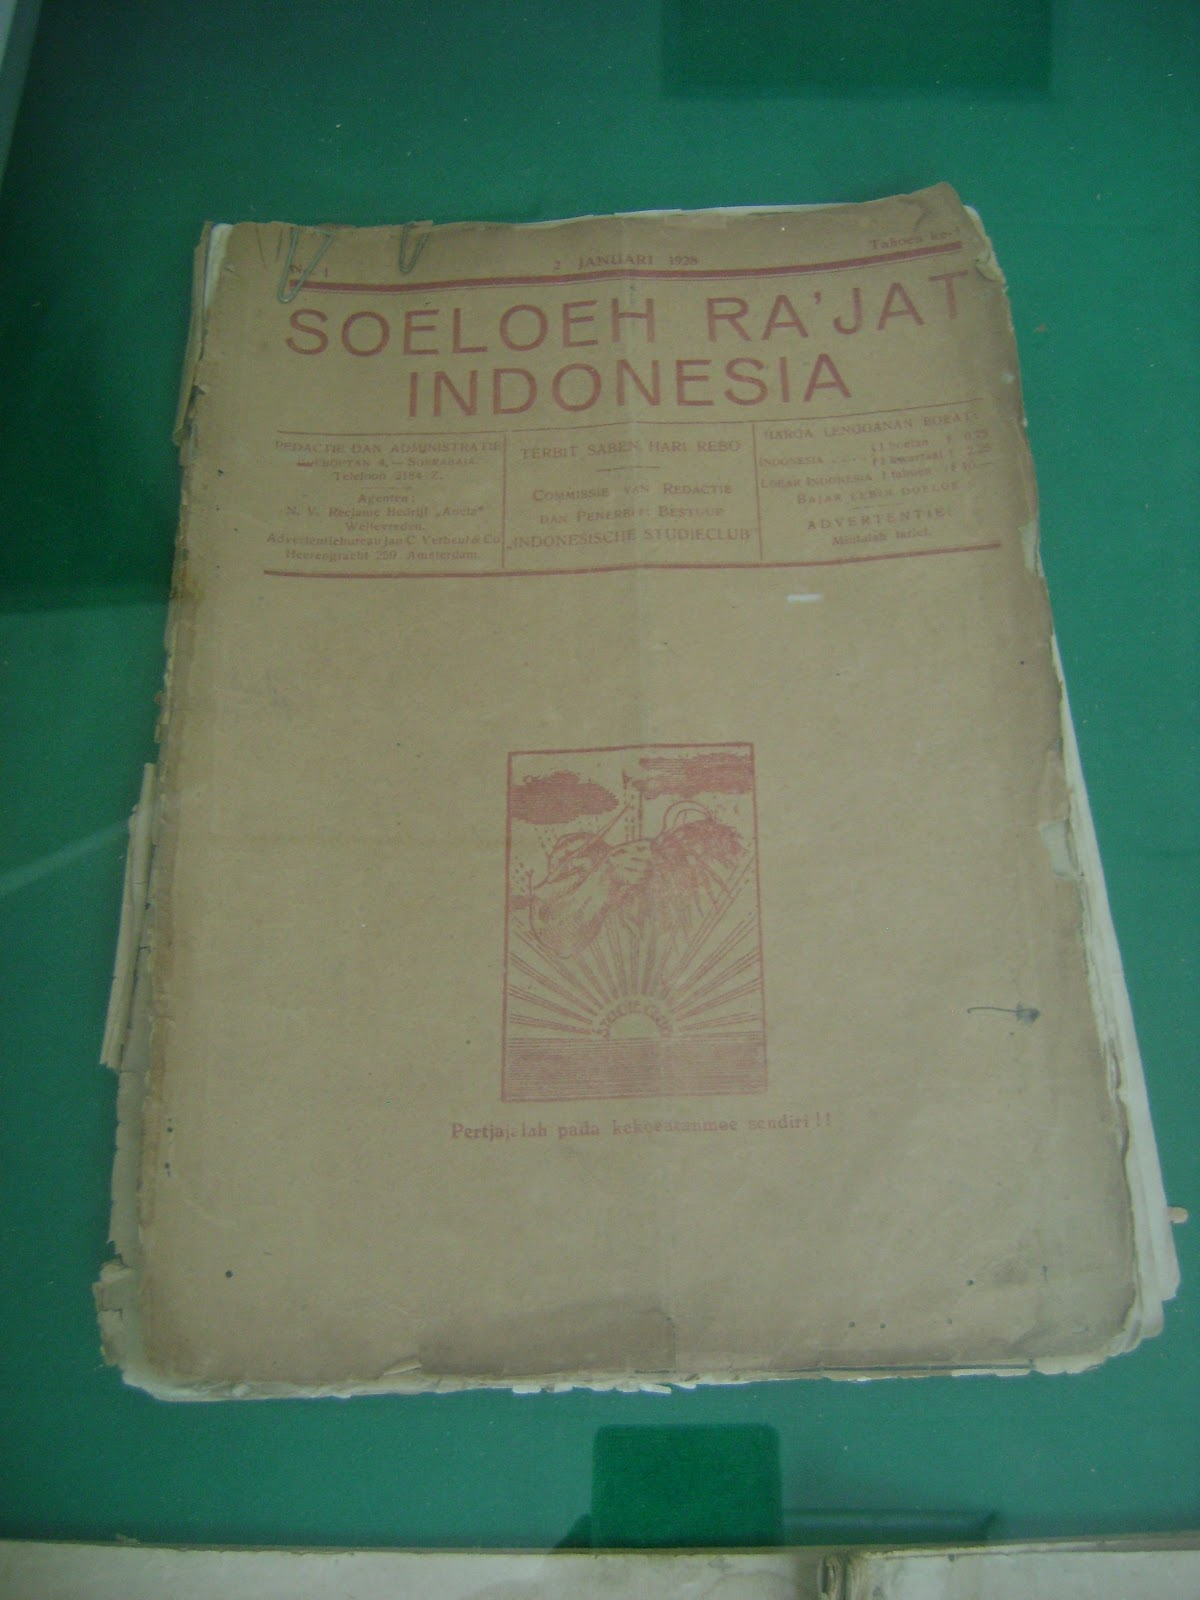 Majalah Soeloeh Ra Jat Indonesia Kekunaan Vihara Bodhisattva Karaniya Metta